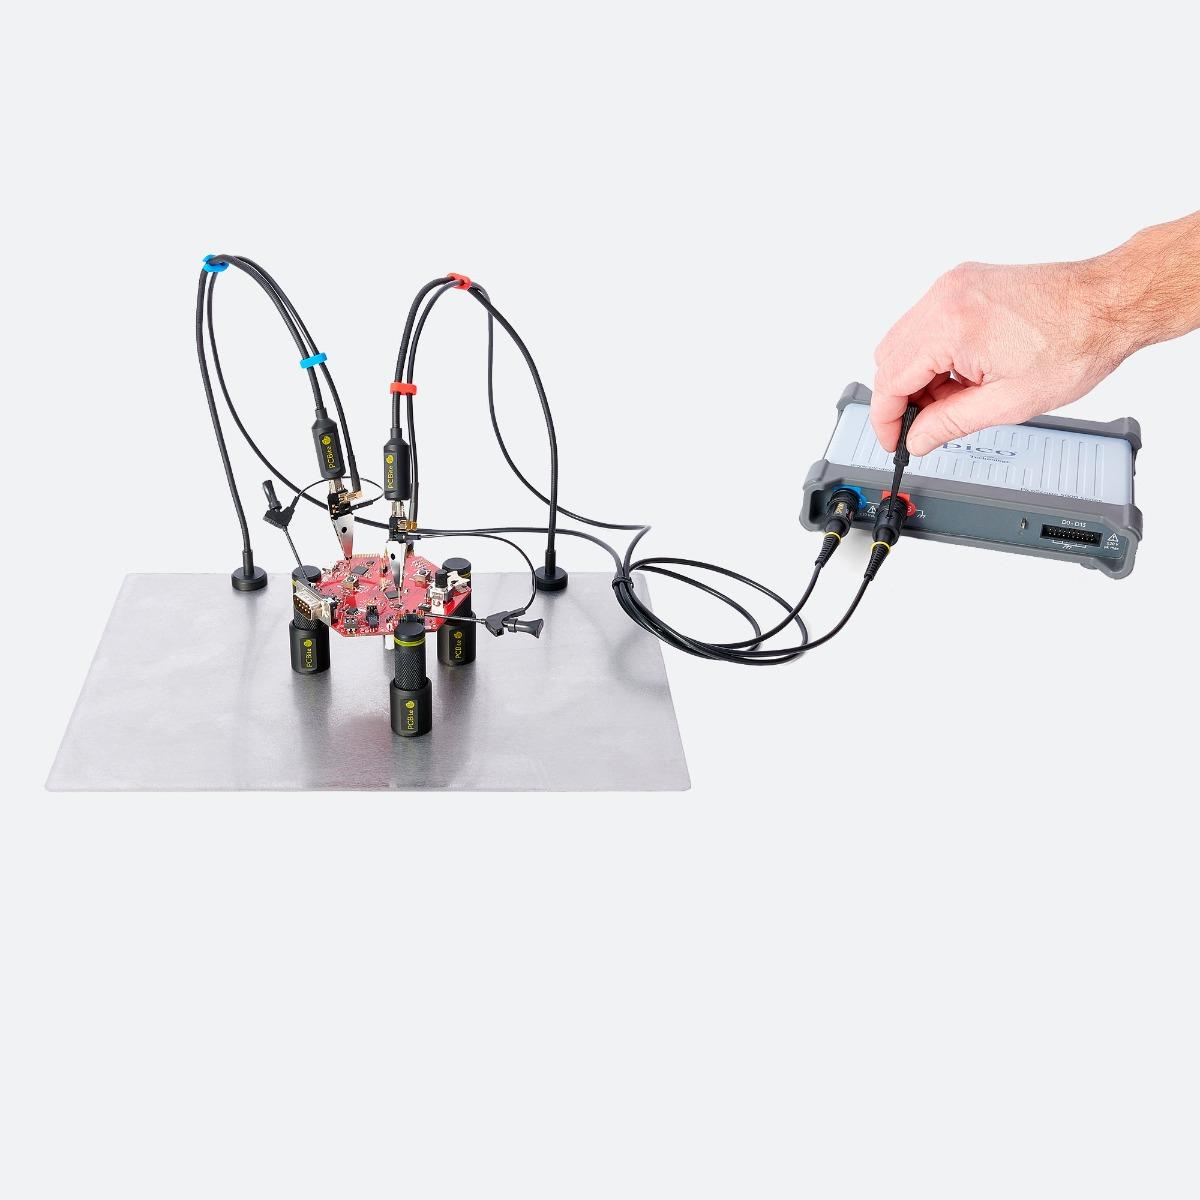 PCBite kit with 2x SP200 200 Mhz handsfree oscilloscope probes [4016]